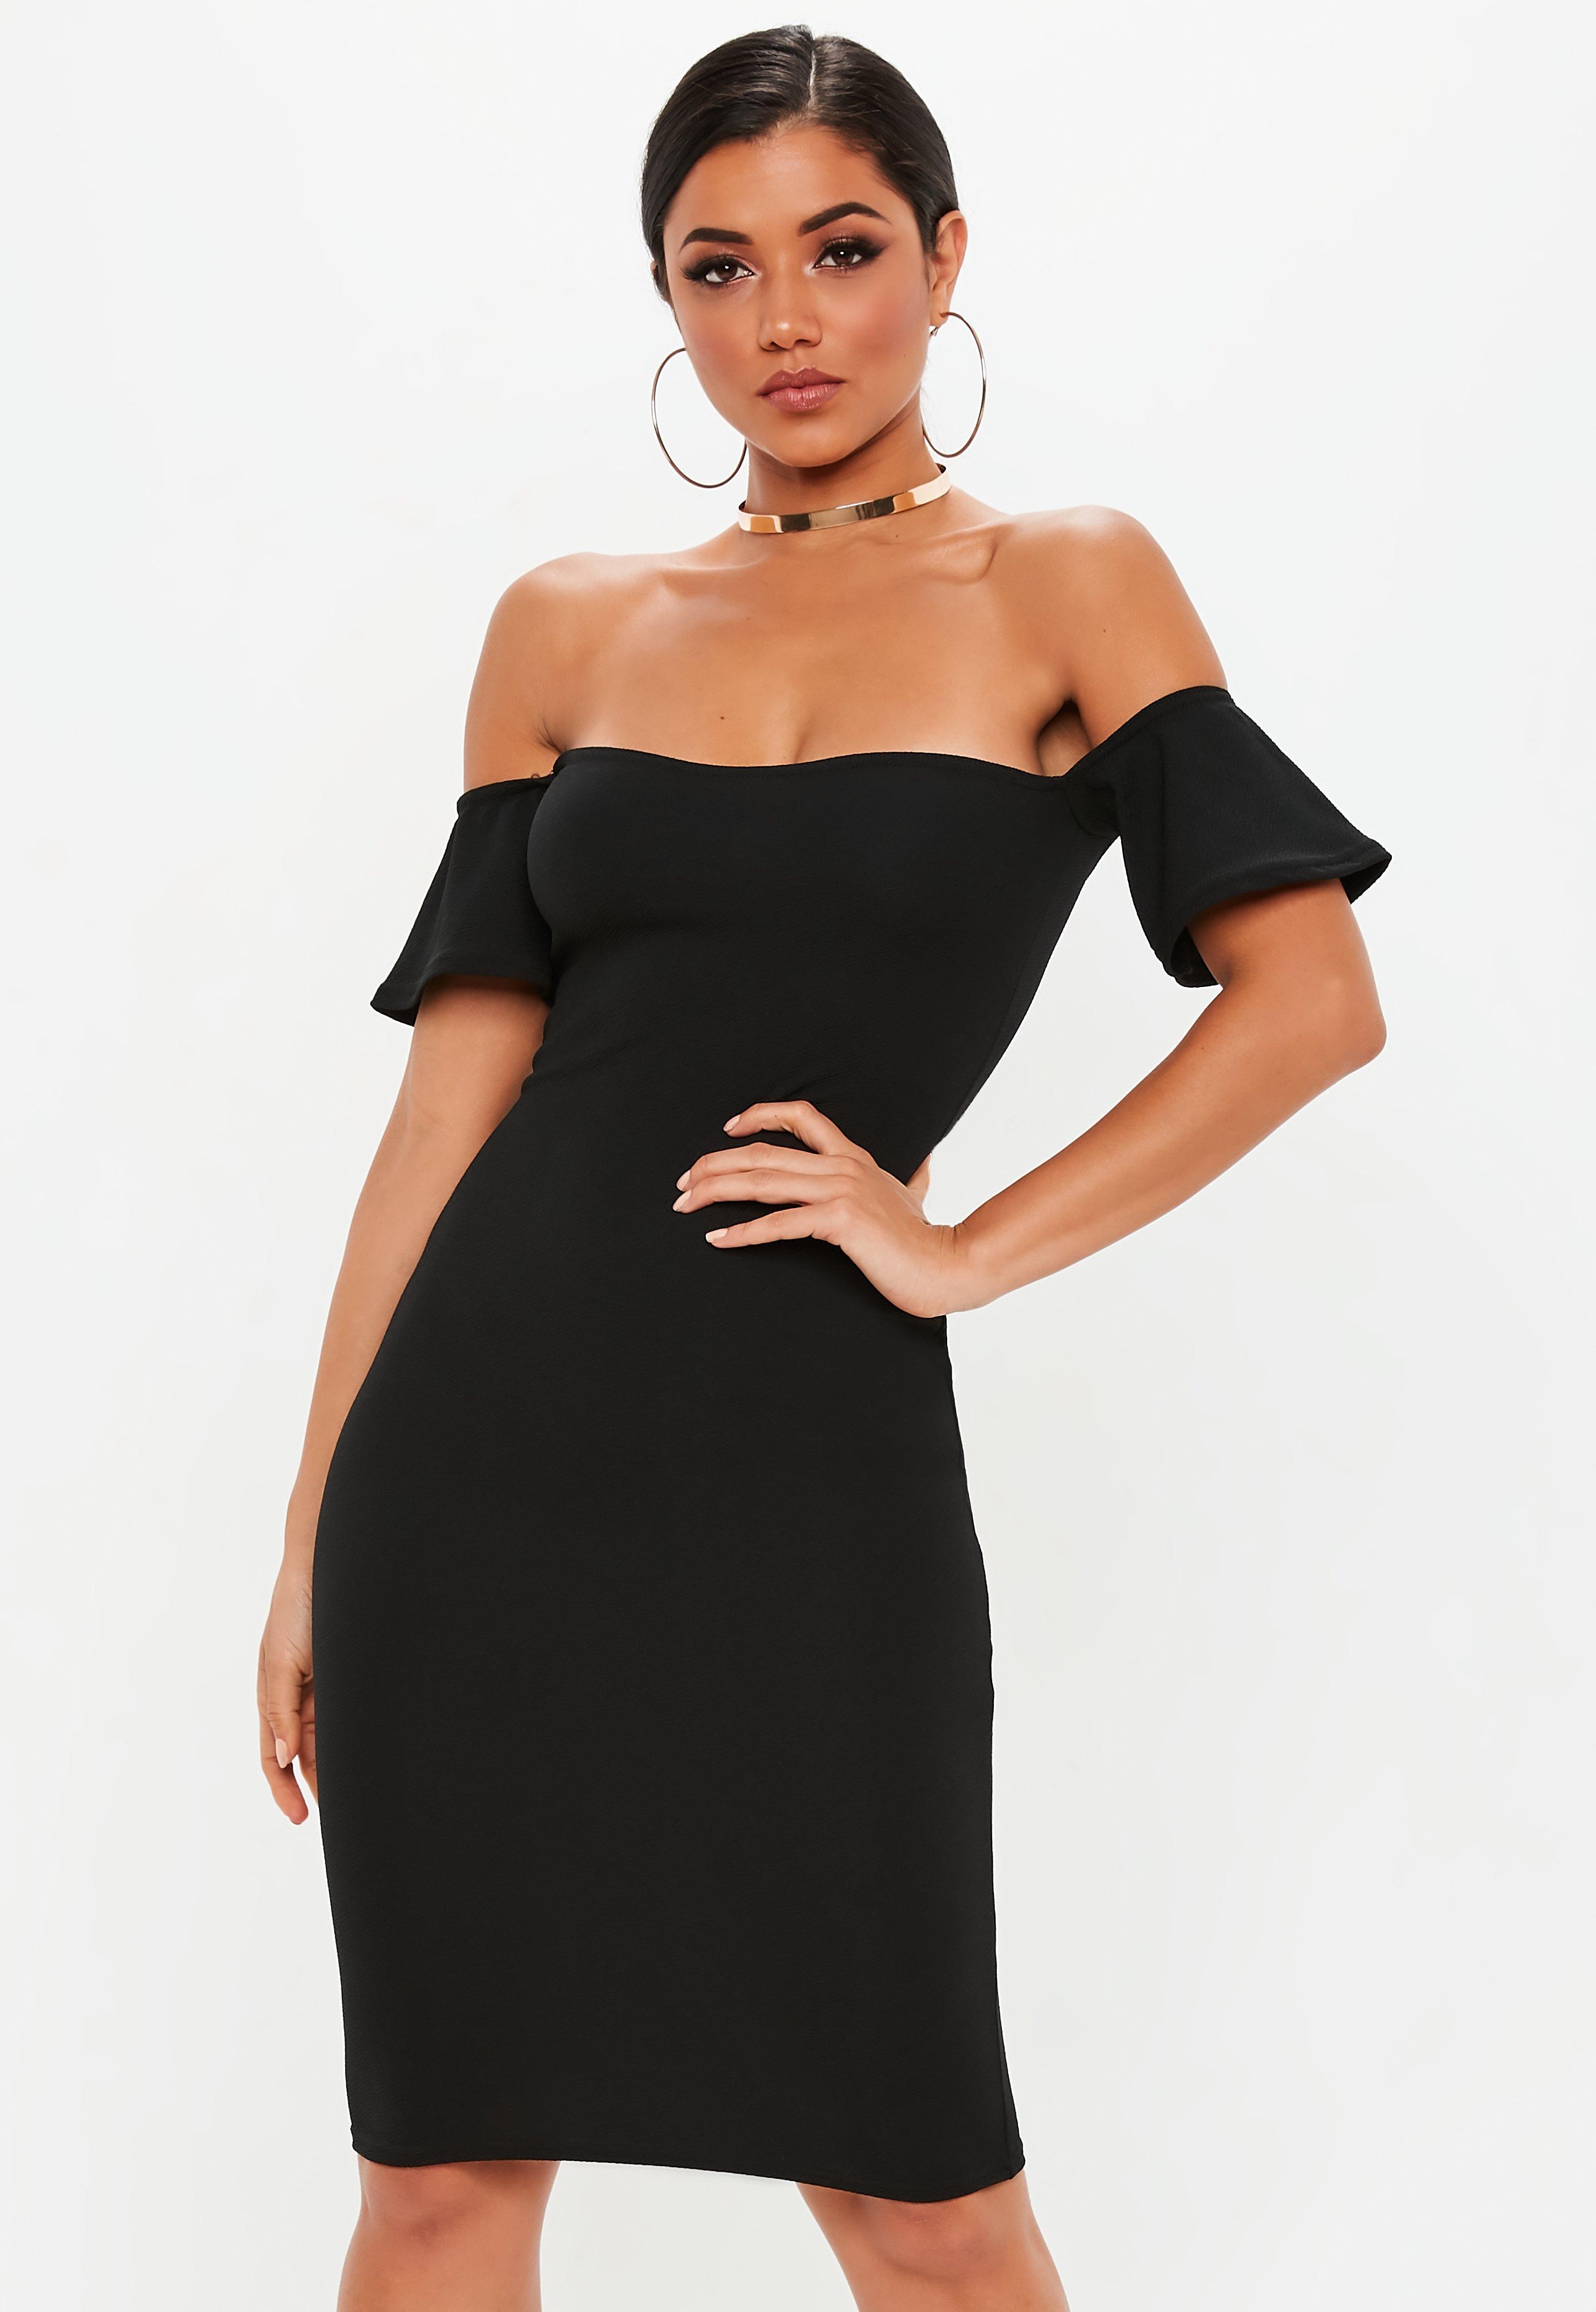 Bardot Dress - Black Only t8n5EFaRep